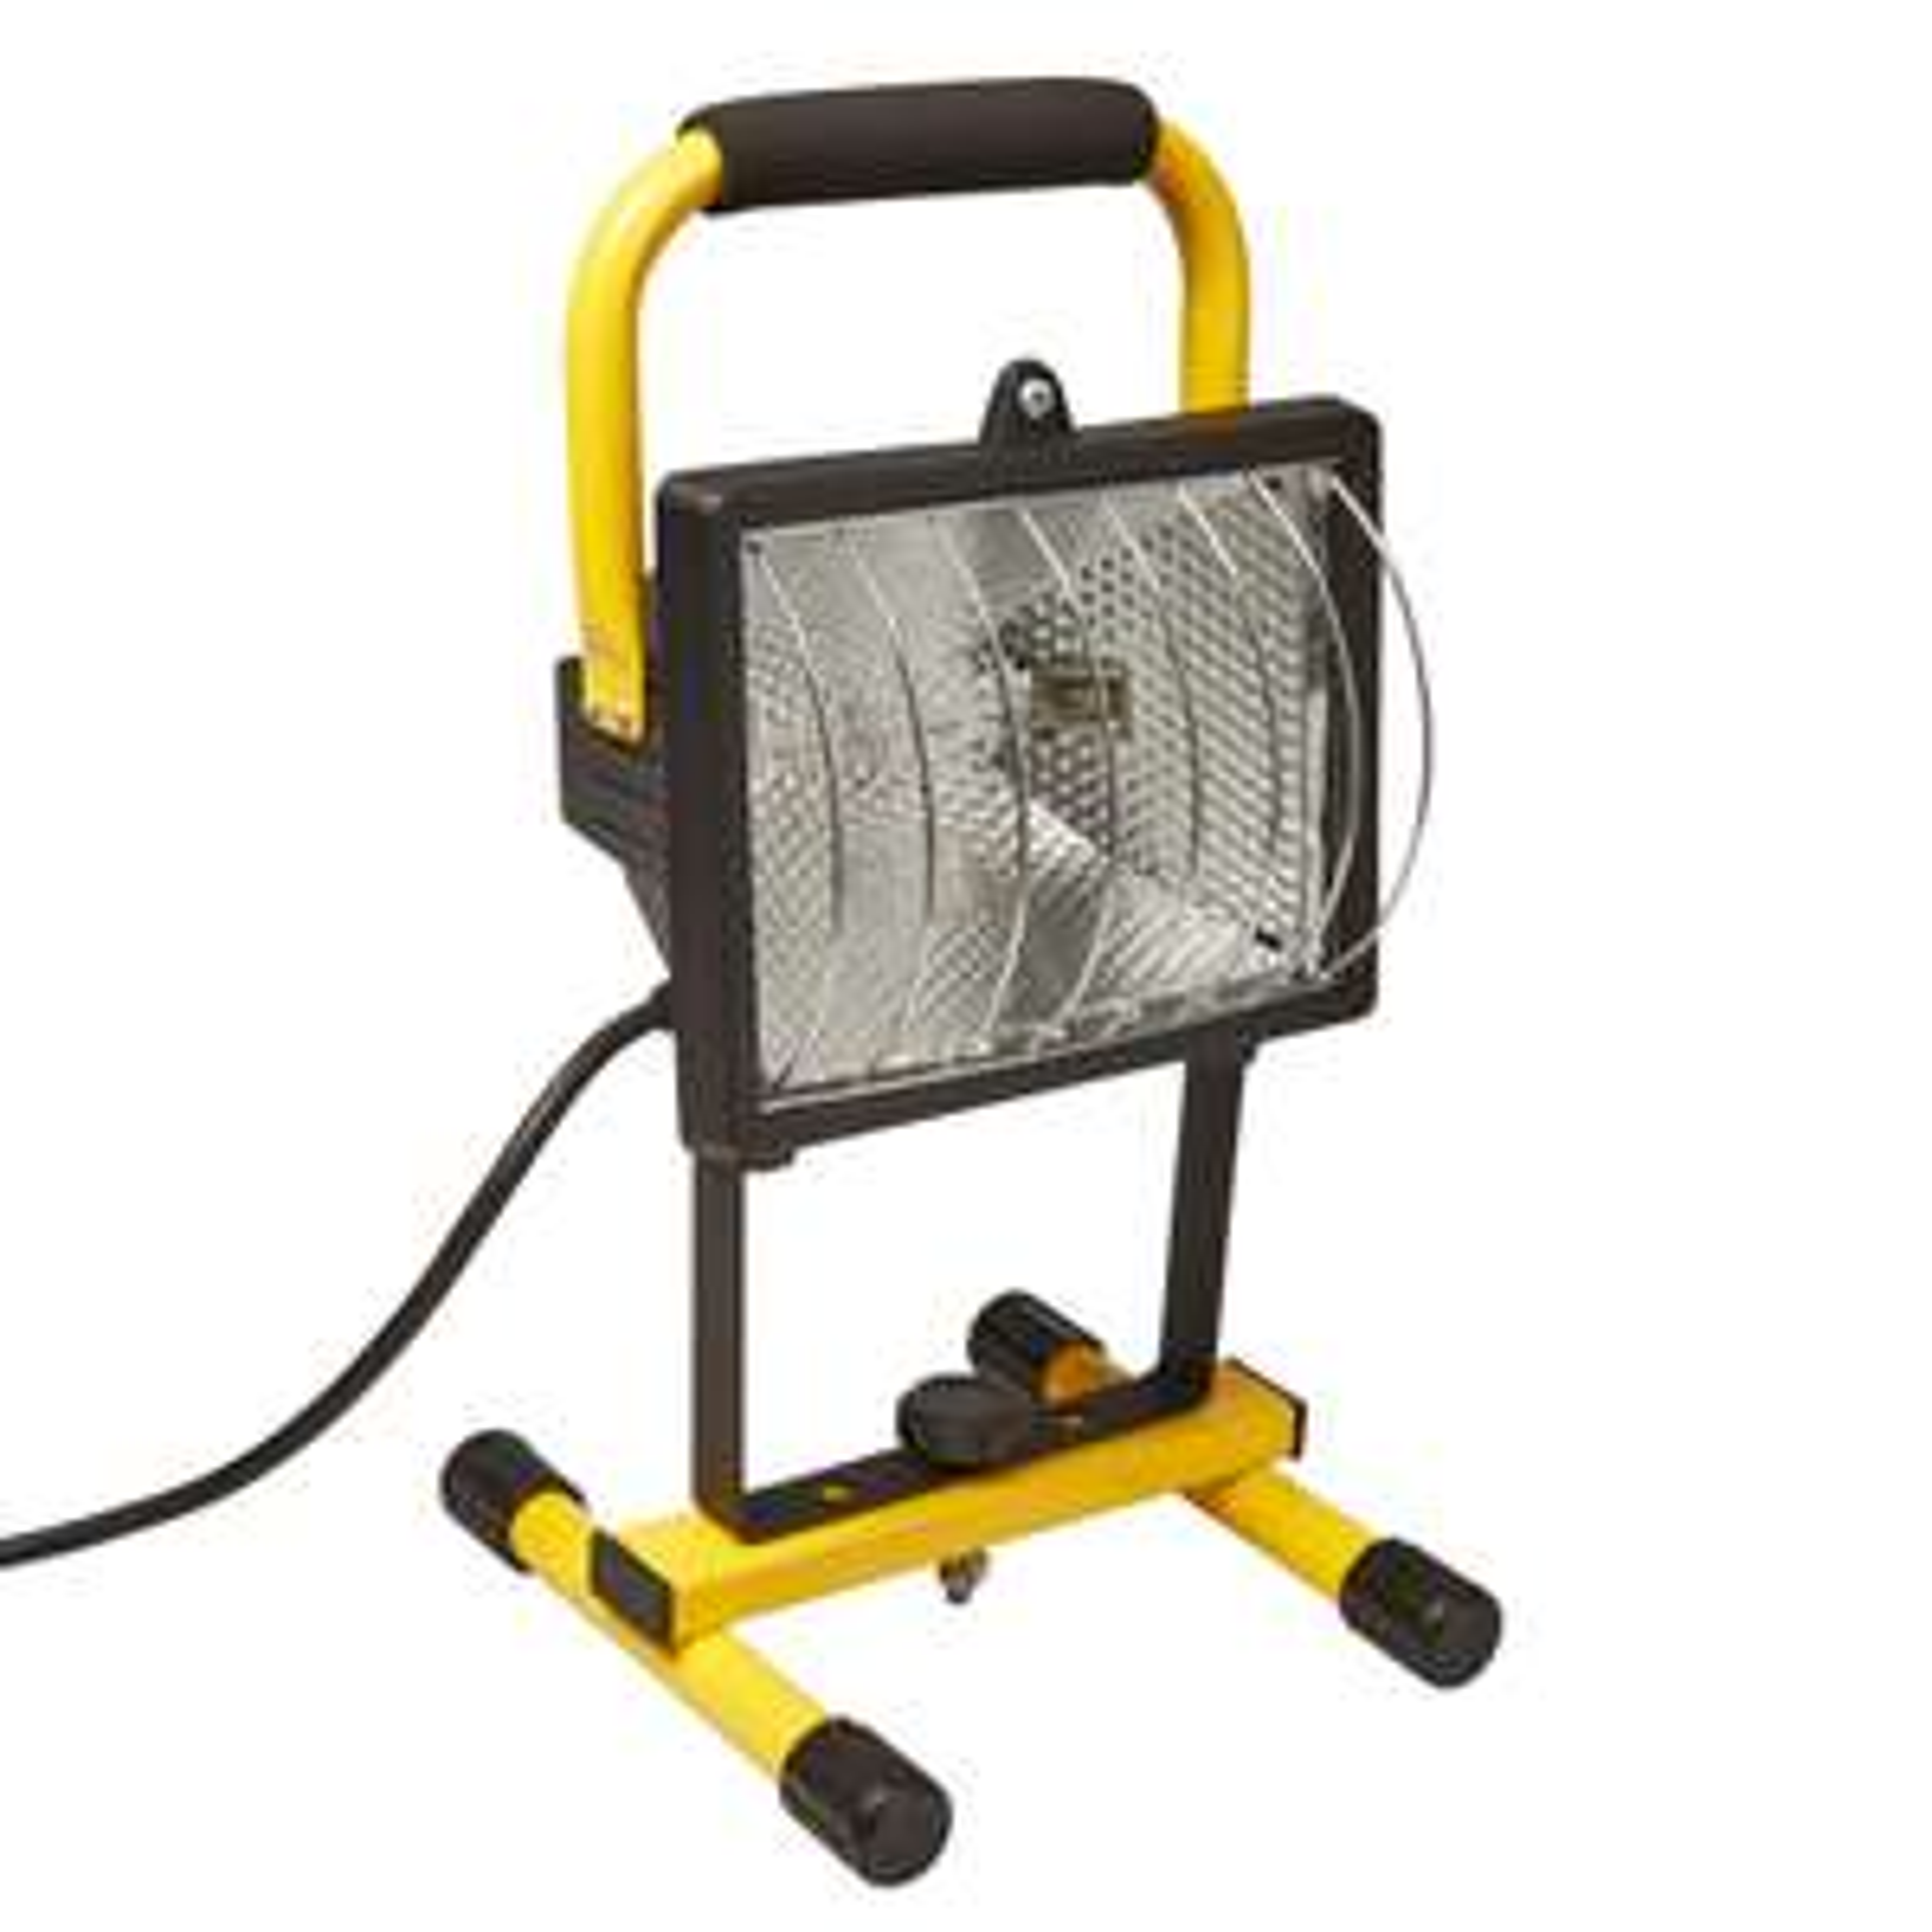 HALF price Diall portable work light 400W now £7-50 @ B&Q,free c+c